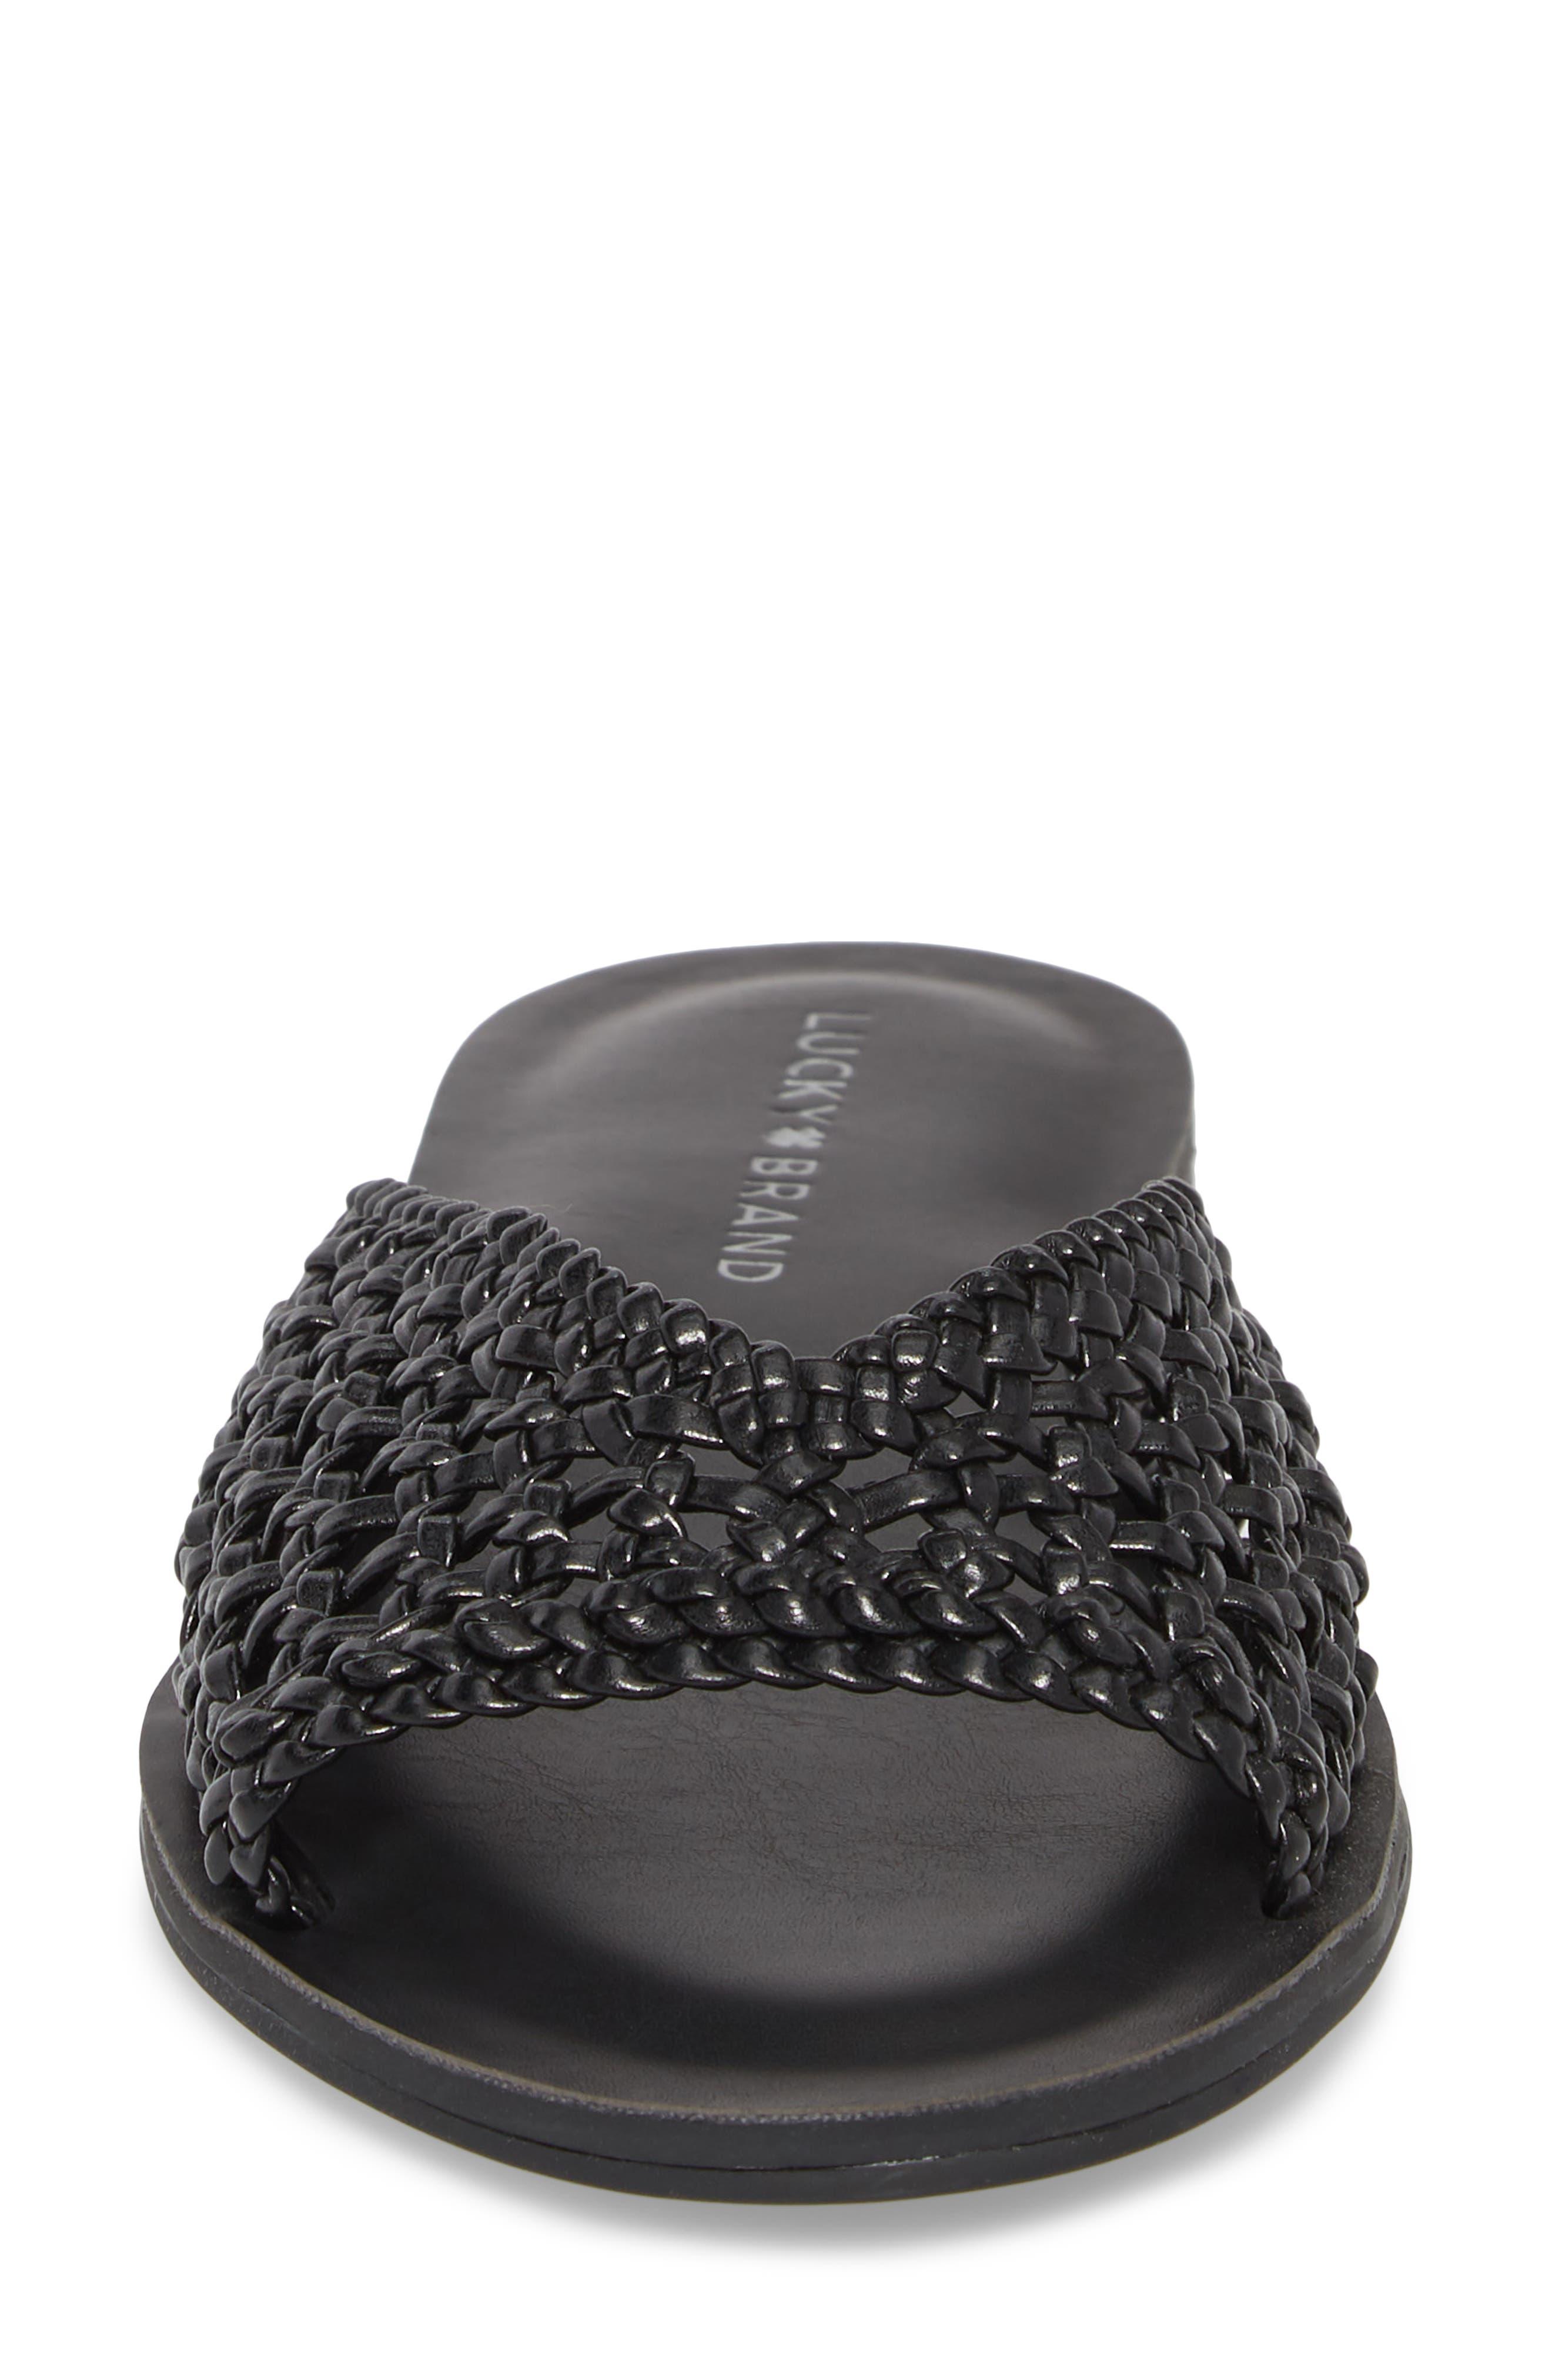 Adola Slide Sandal,                             Alternate thumbnail 4, color,                             Black Leather